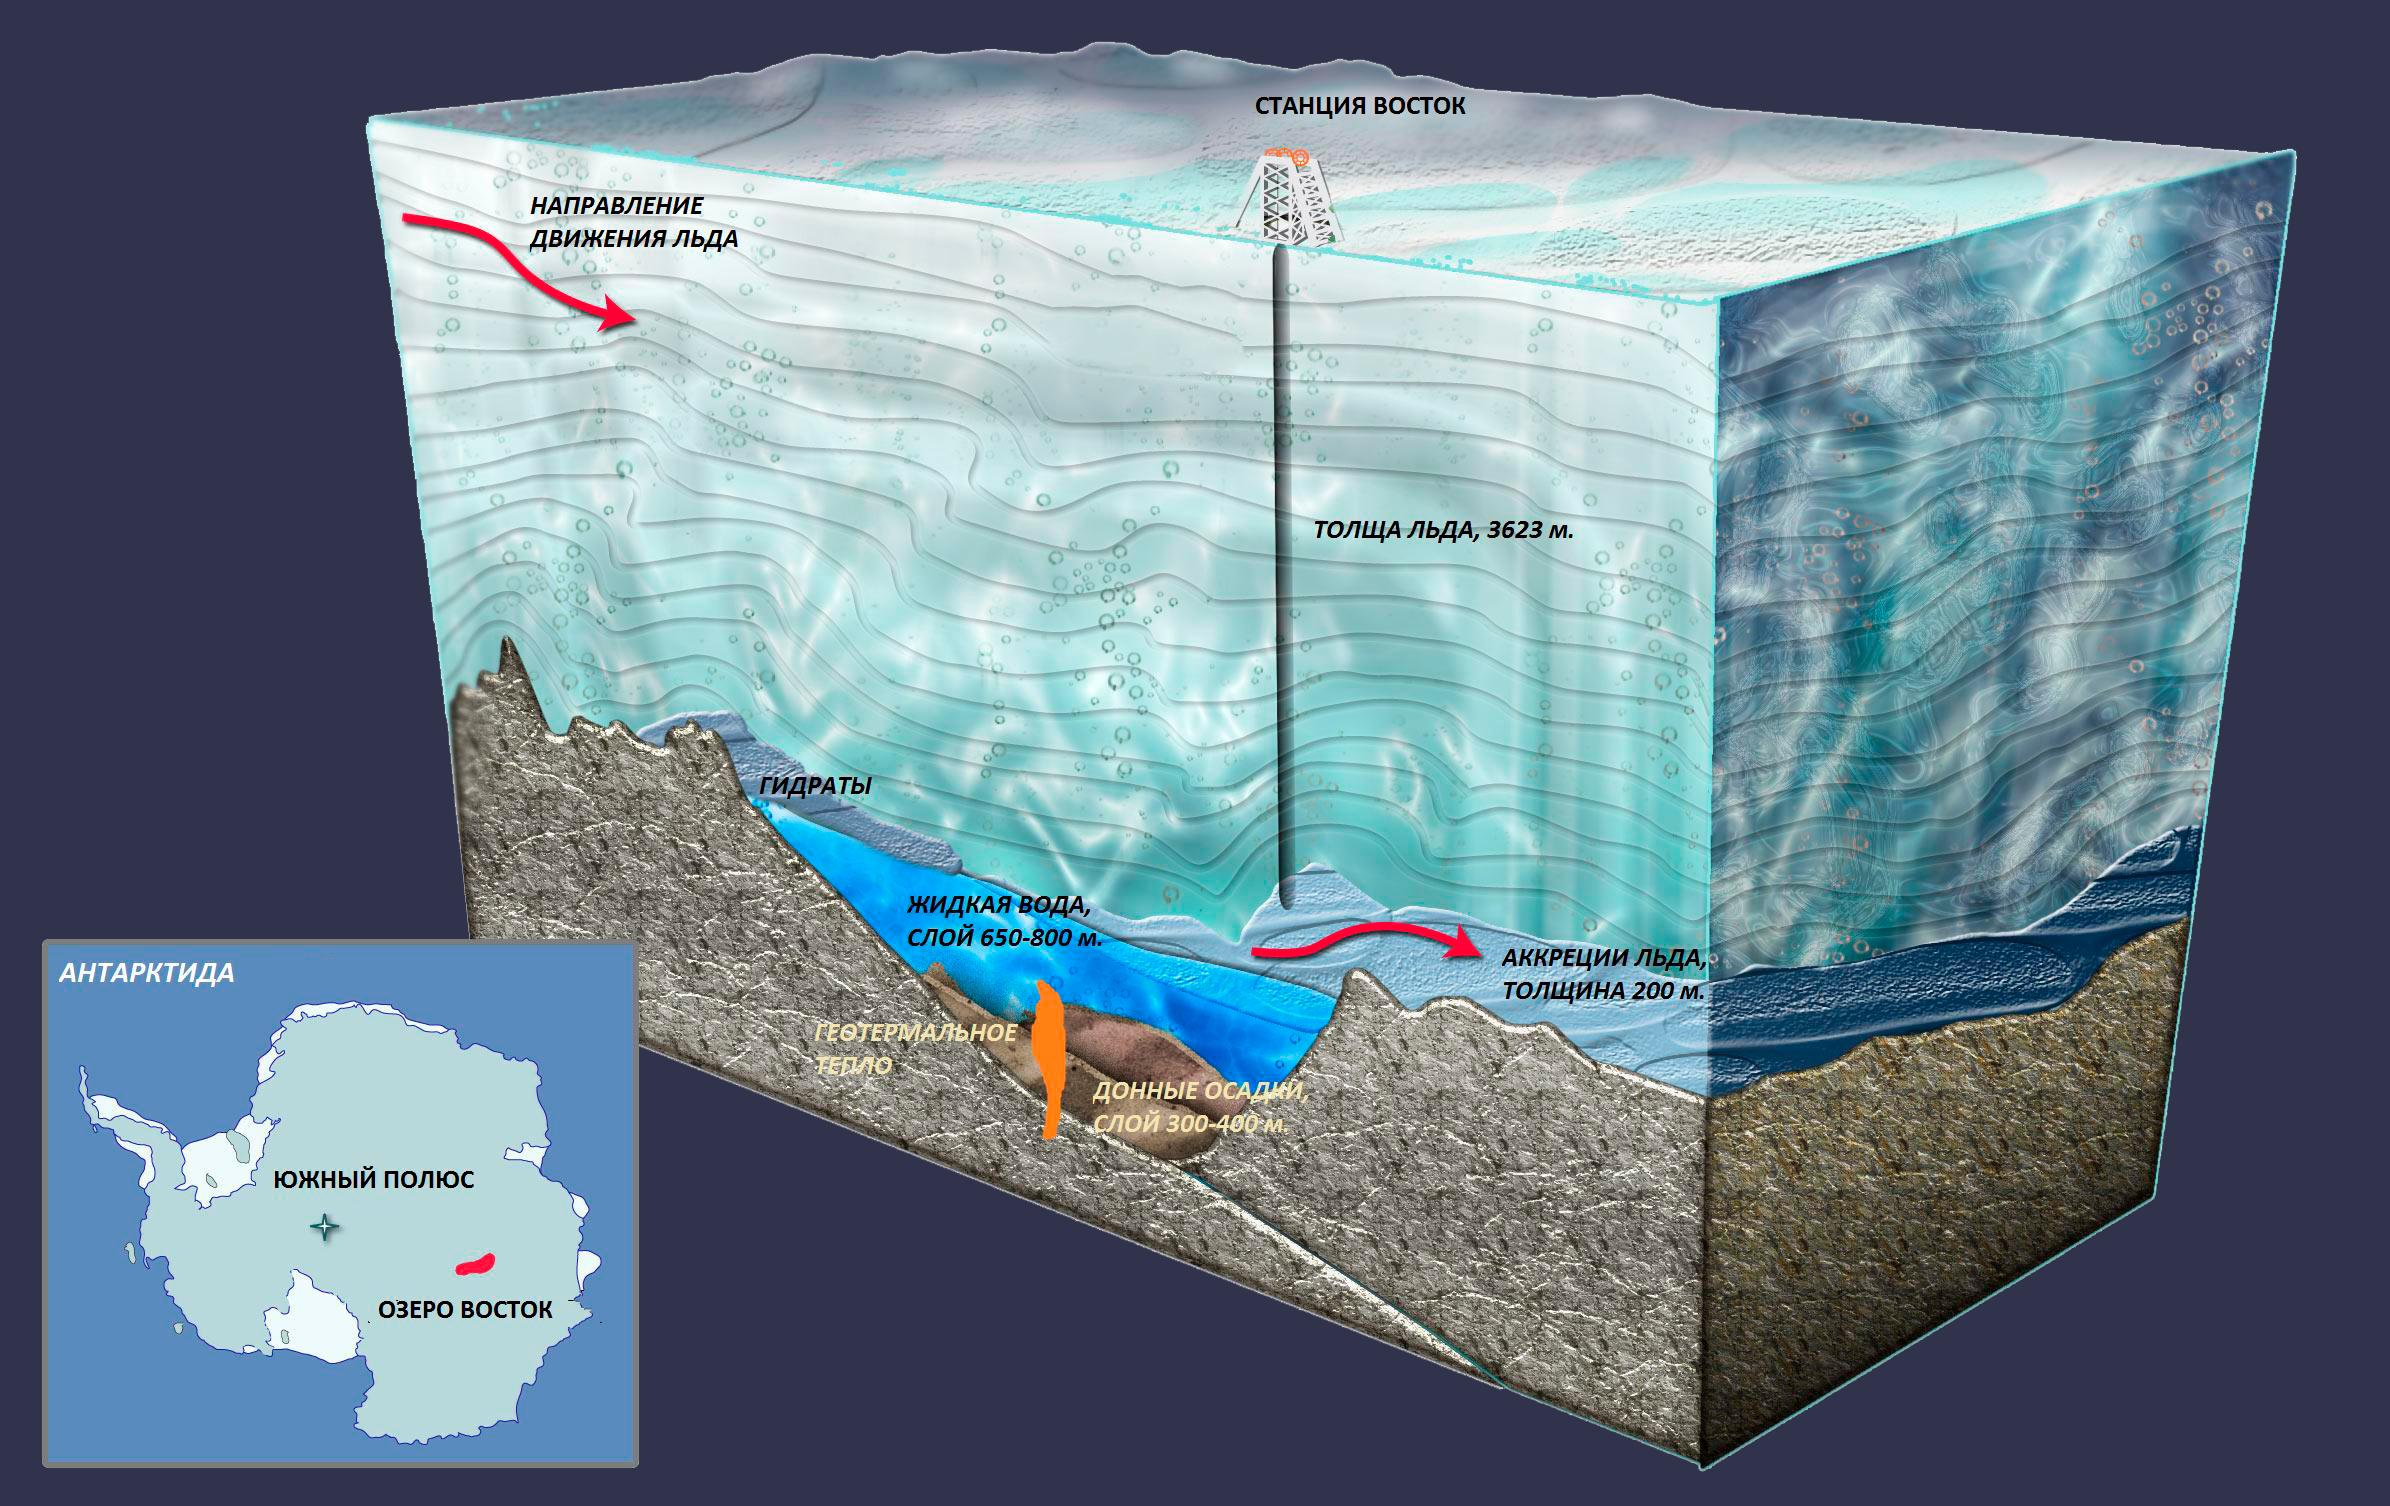 Схема бурения скважины озера Восток в Антарктиде. Фото © Wikipedia